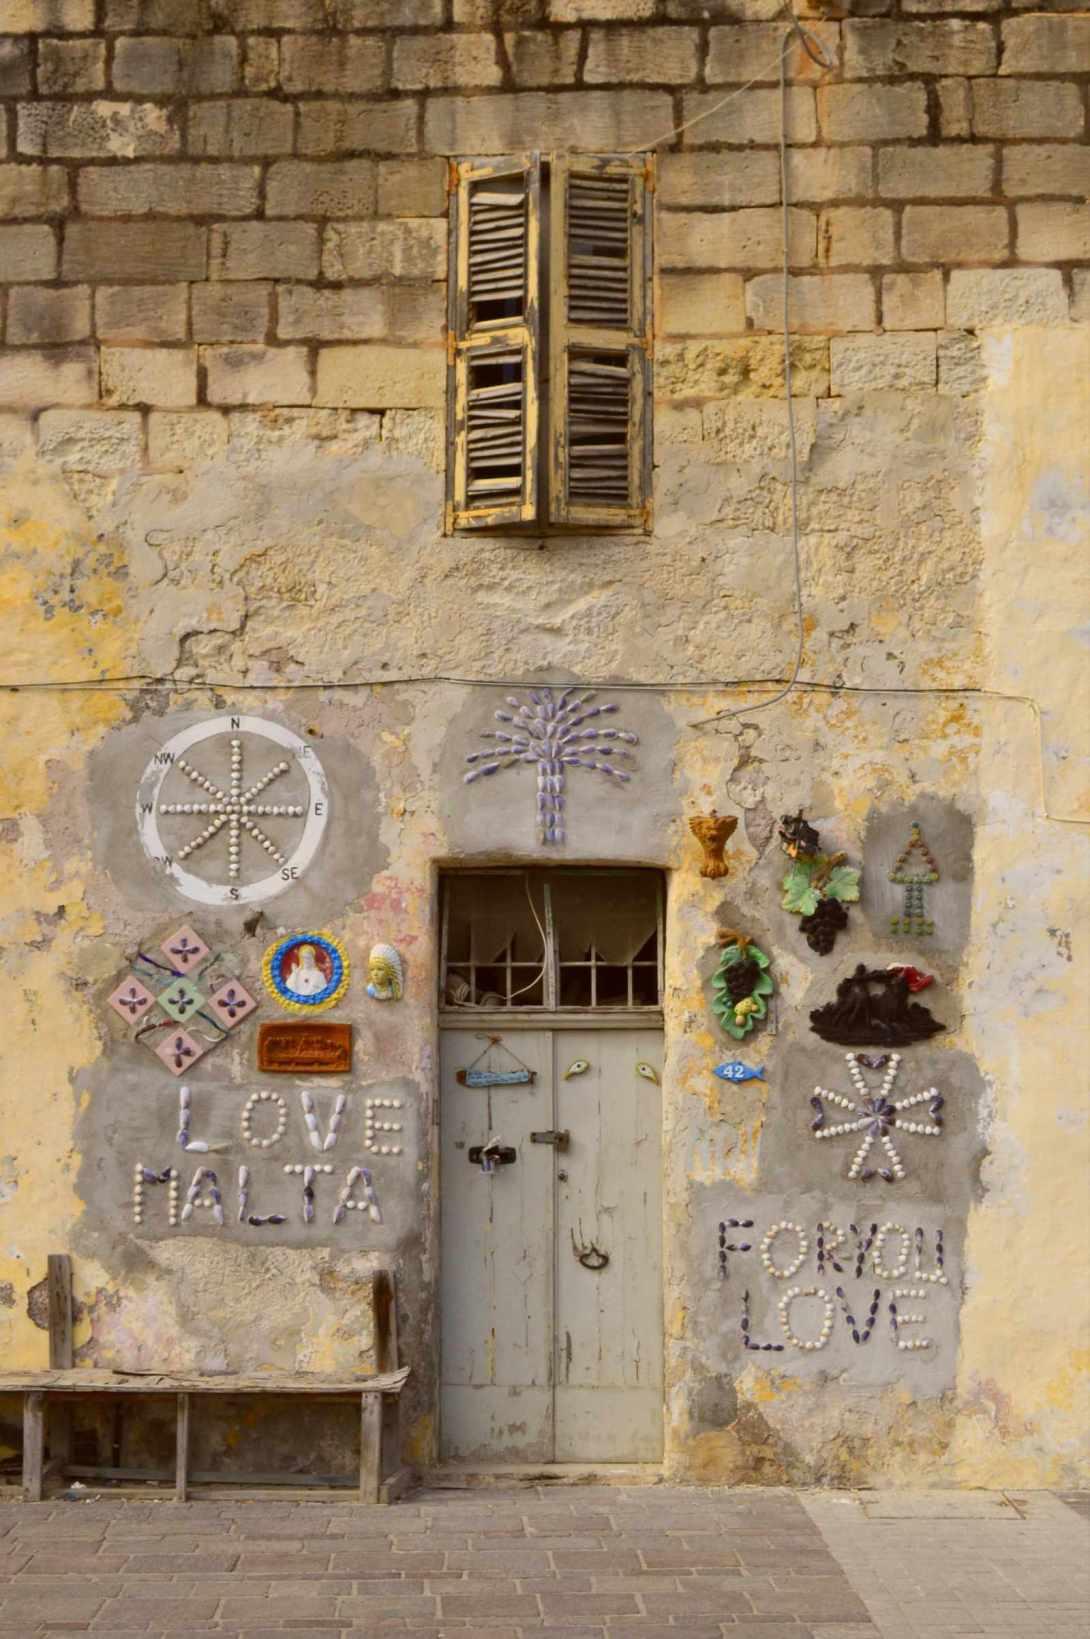 Malta Statues of Madonna #art #malta #madonna